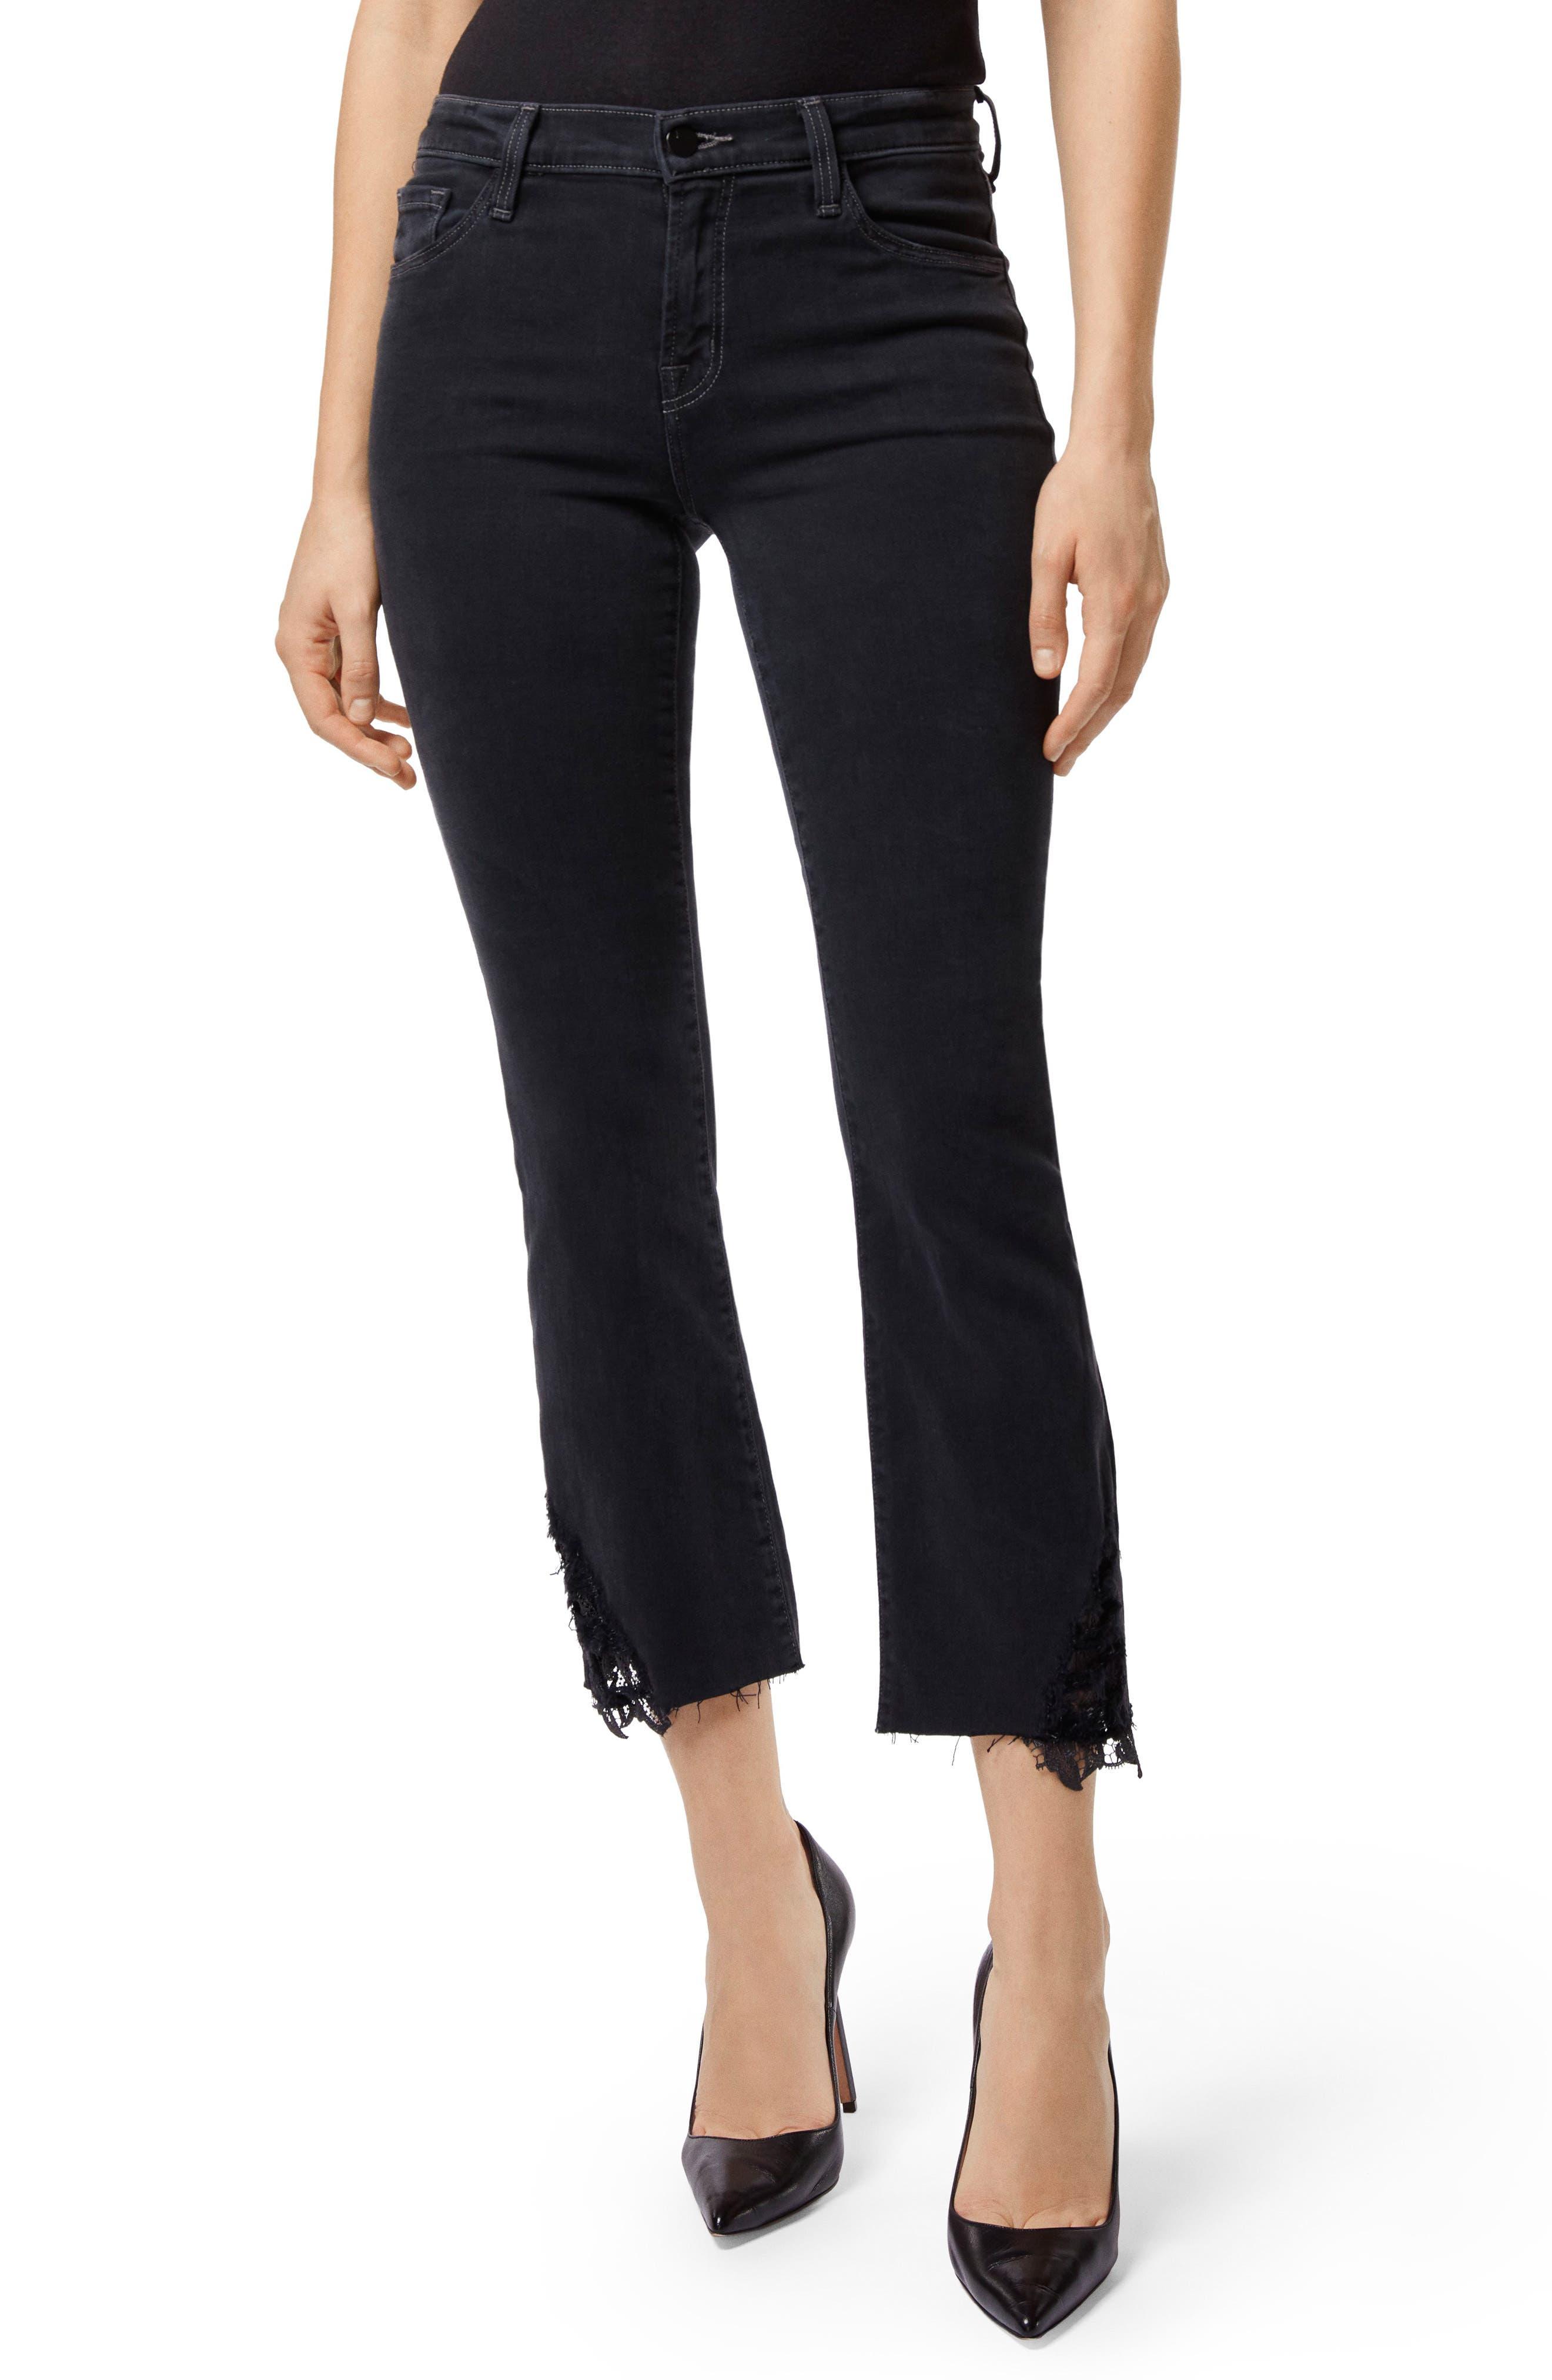 J BRAND,                             Selena Crop Bootcut Jeans,                             Main thumbnail 1, color,                             001